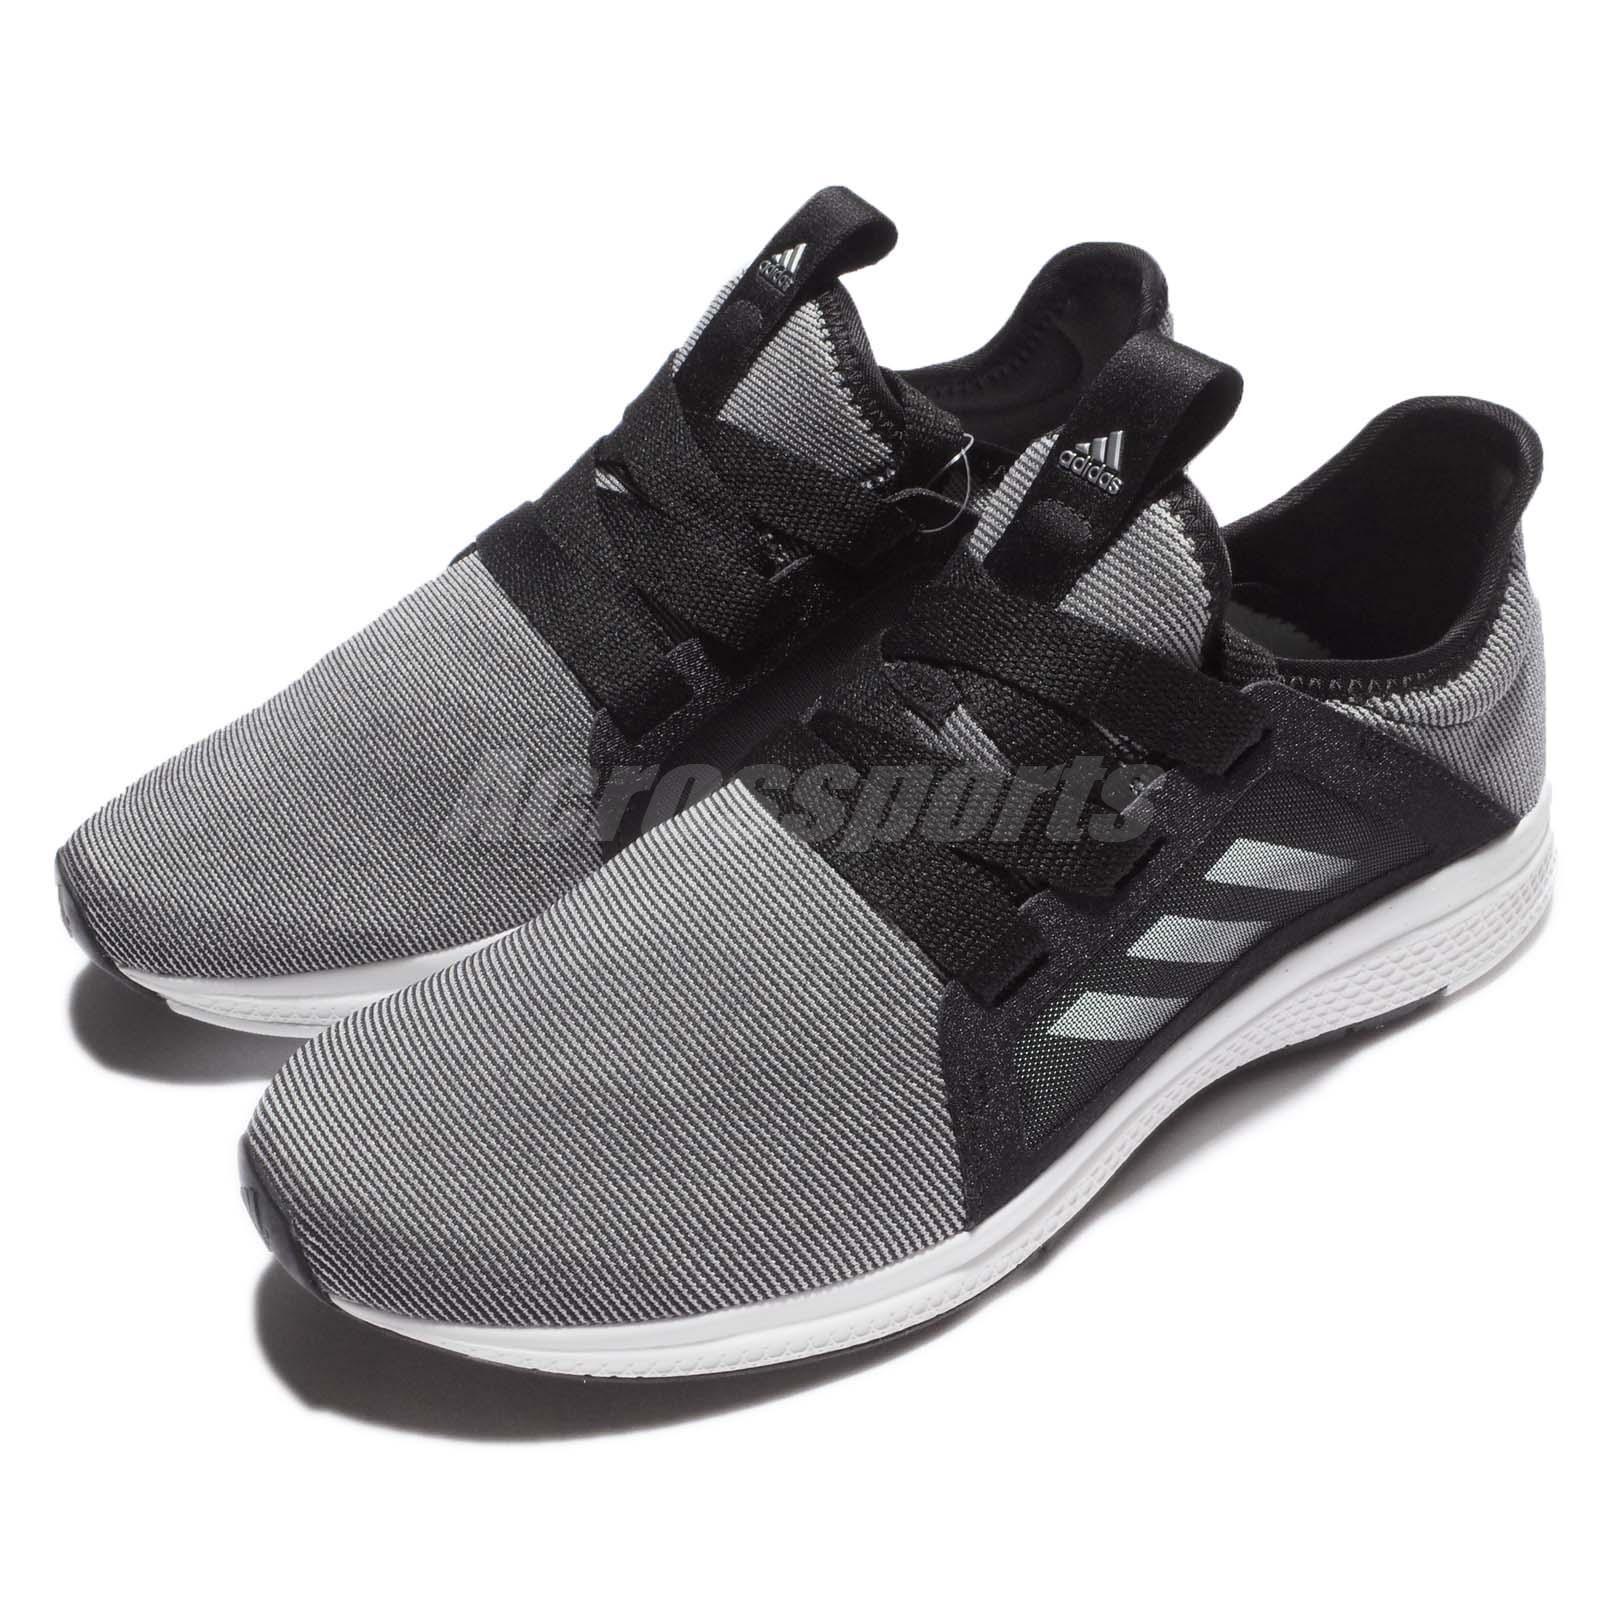 adidas Edge Lux W Women BOUNCE Black Grey White Women W Running Shoes Sneakers BB8211 286736